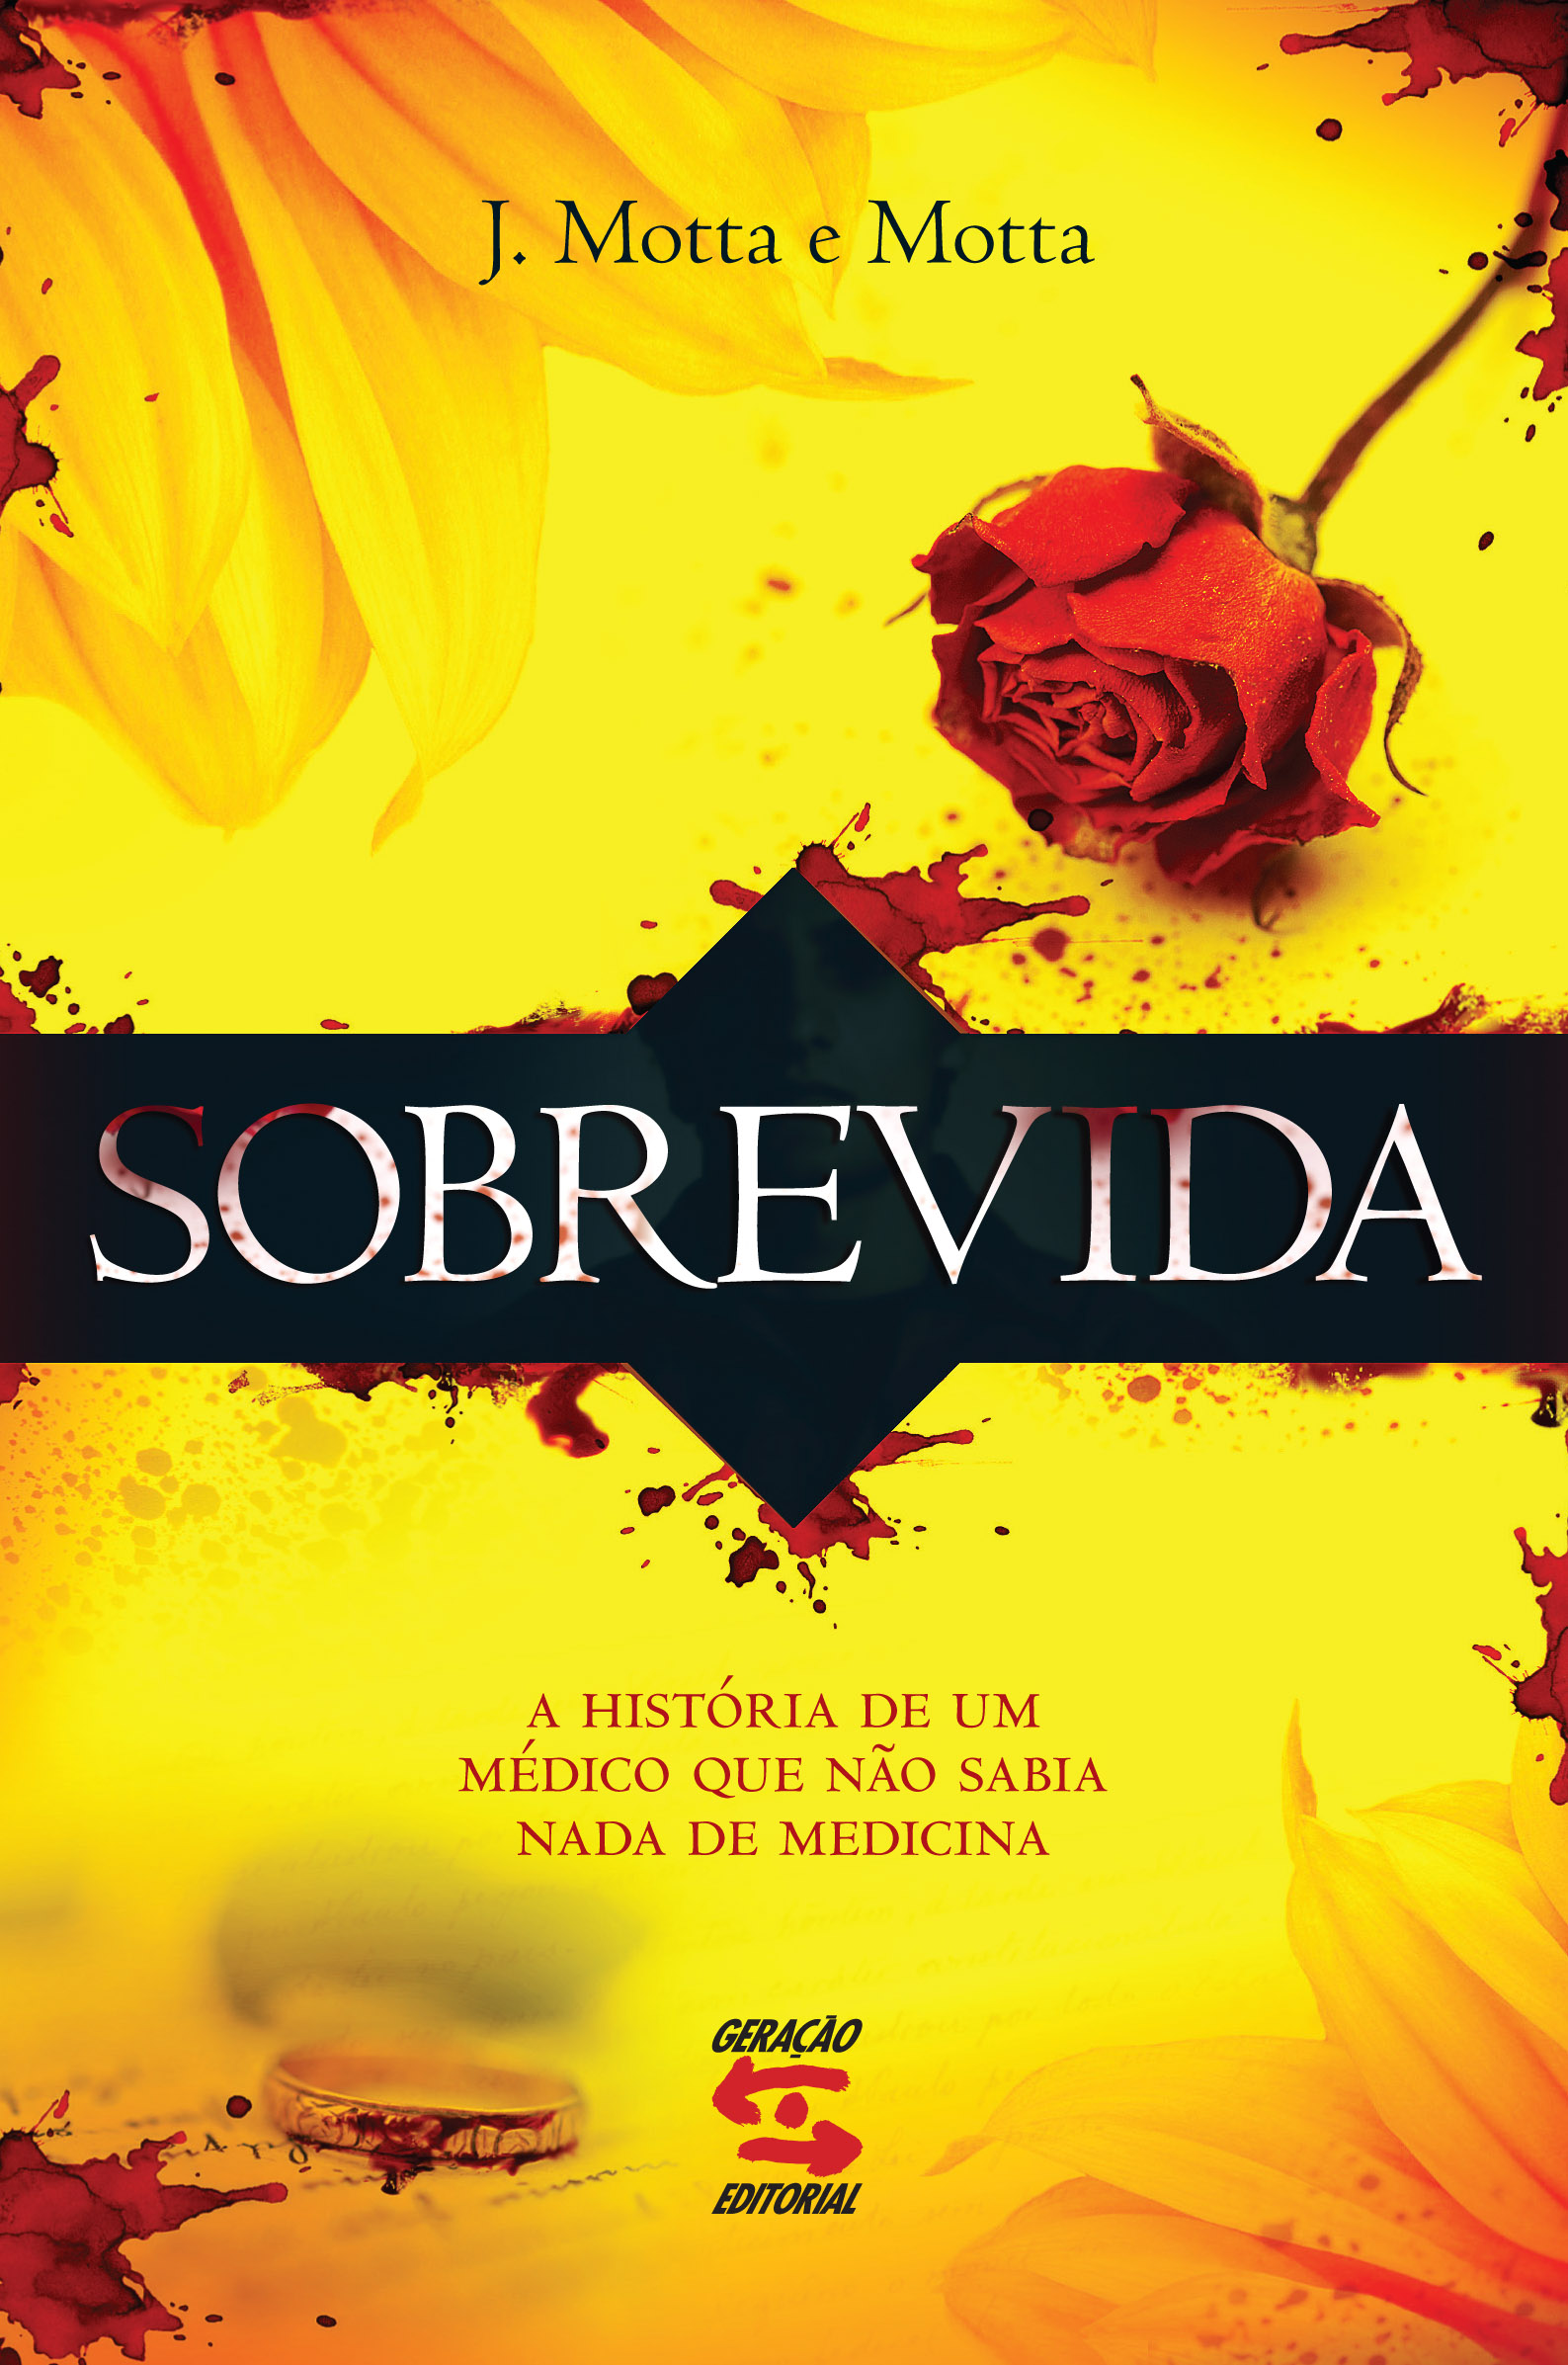 SOBREVIDA, livro de JOSIANE MOTTA E MOTTA